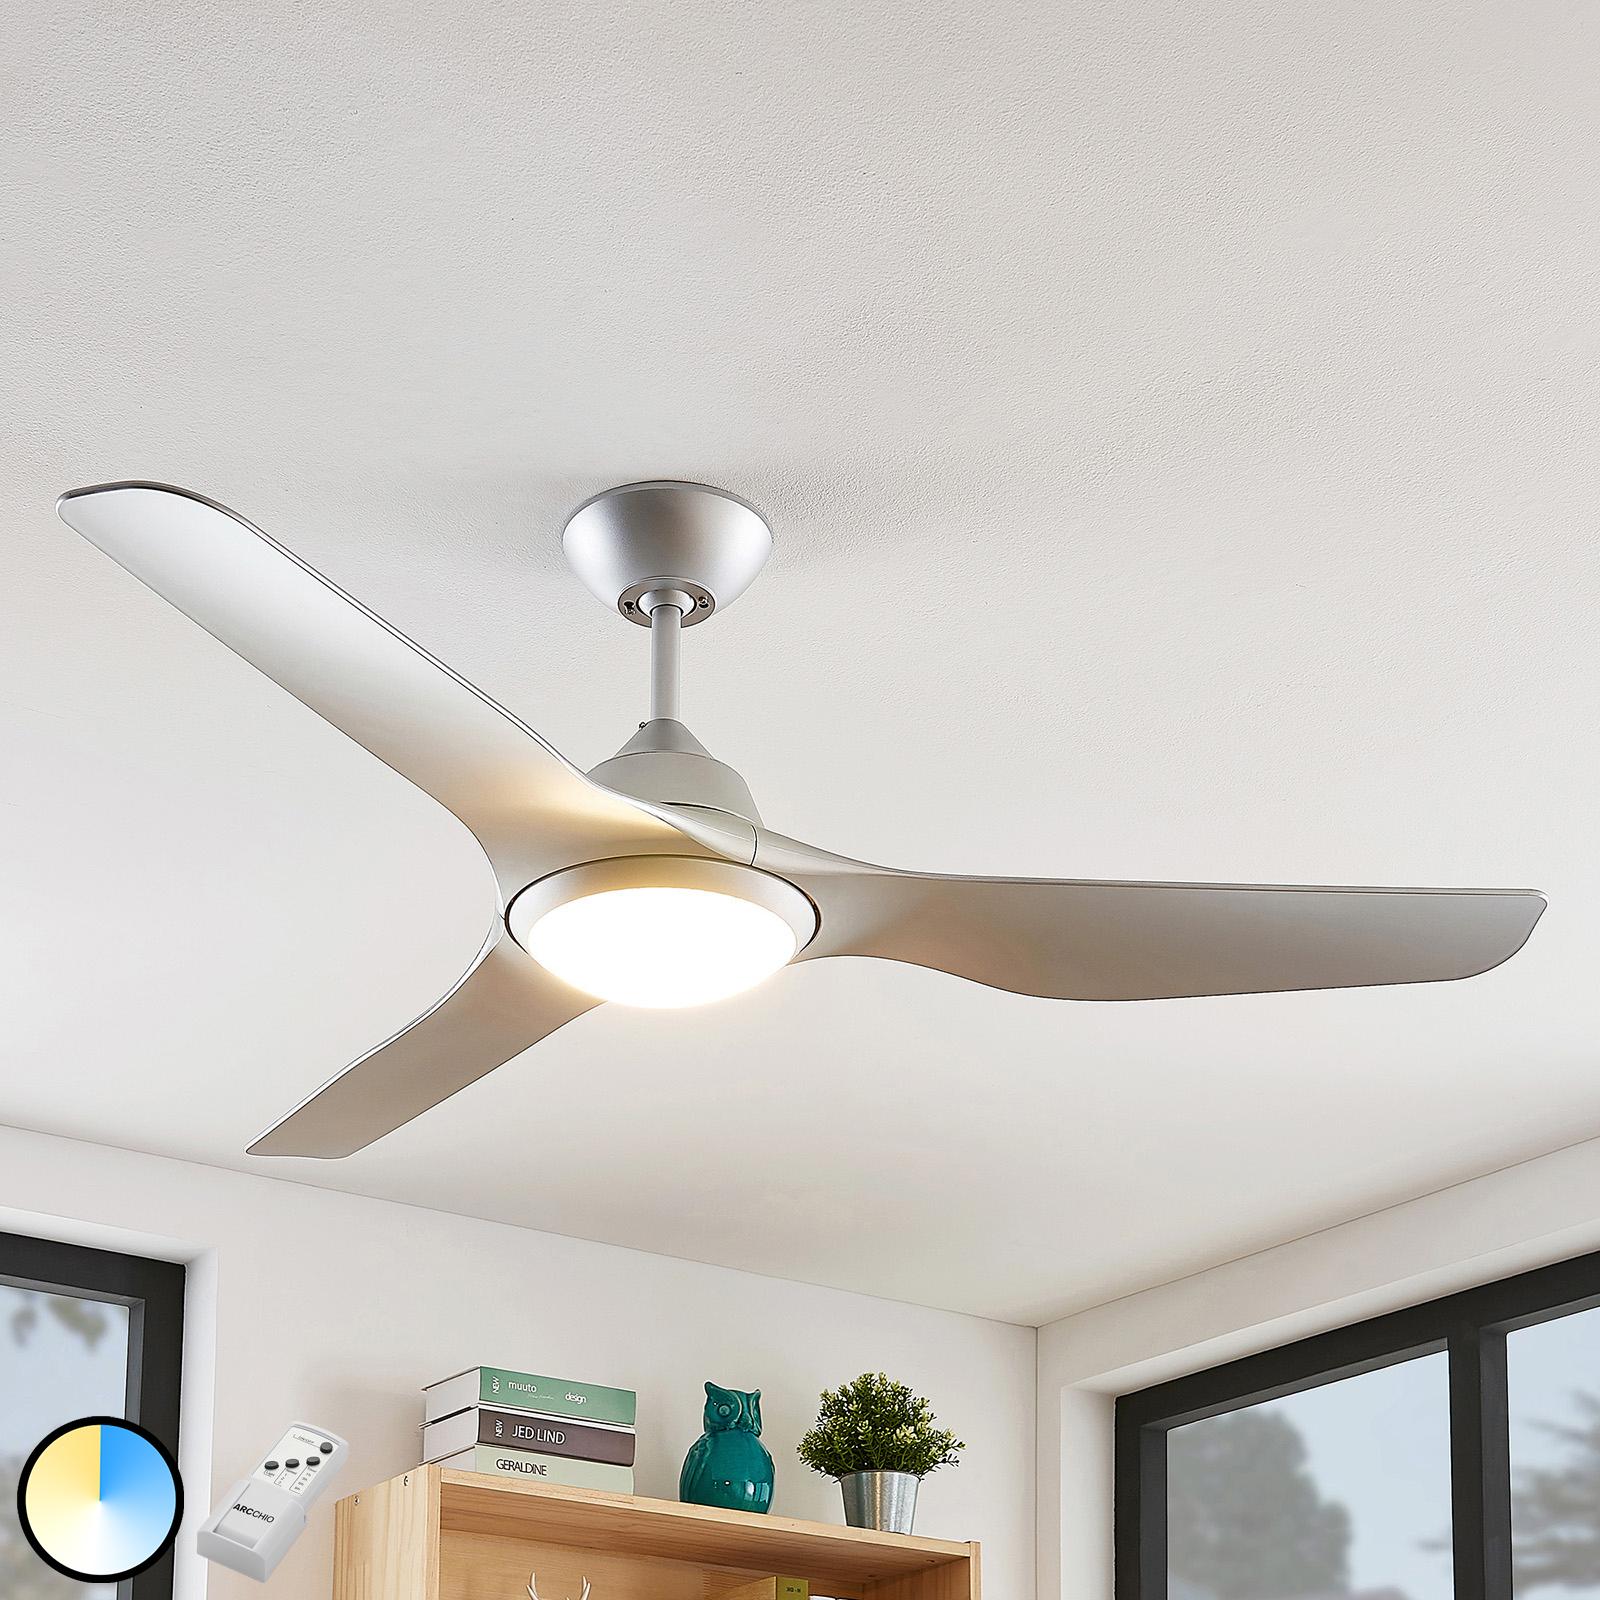 Arcchio Pira LED plafondventilator, 3 vl., zilver